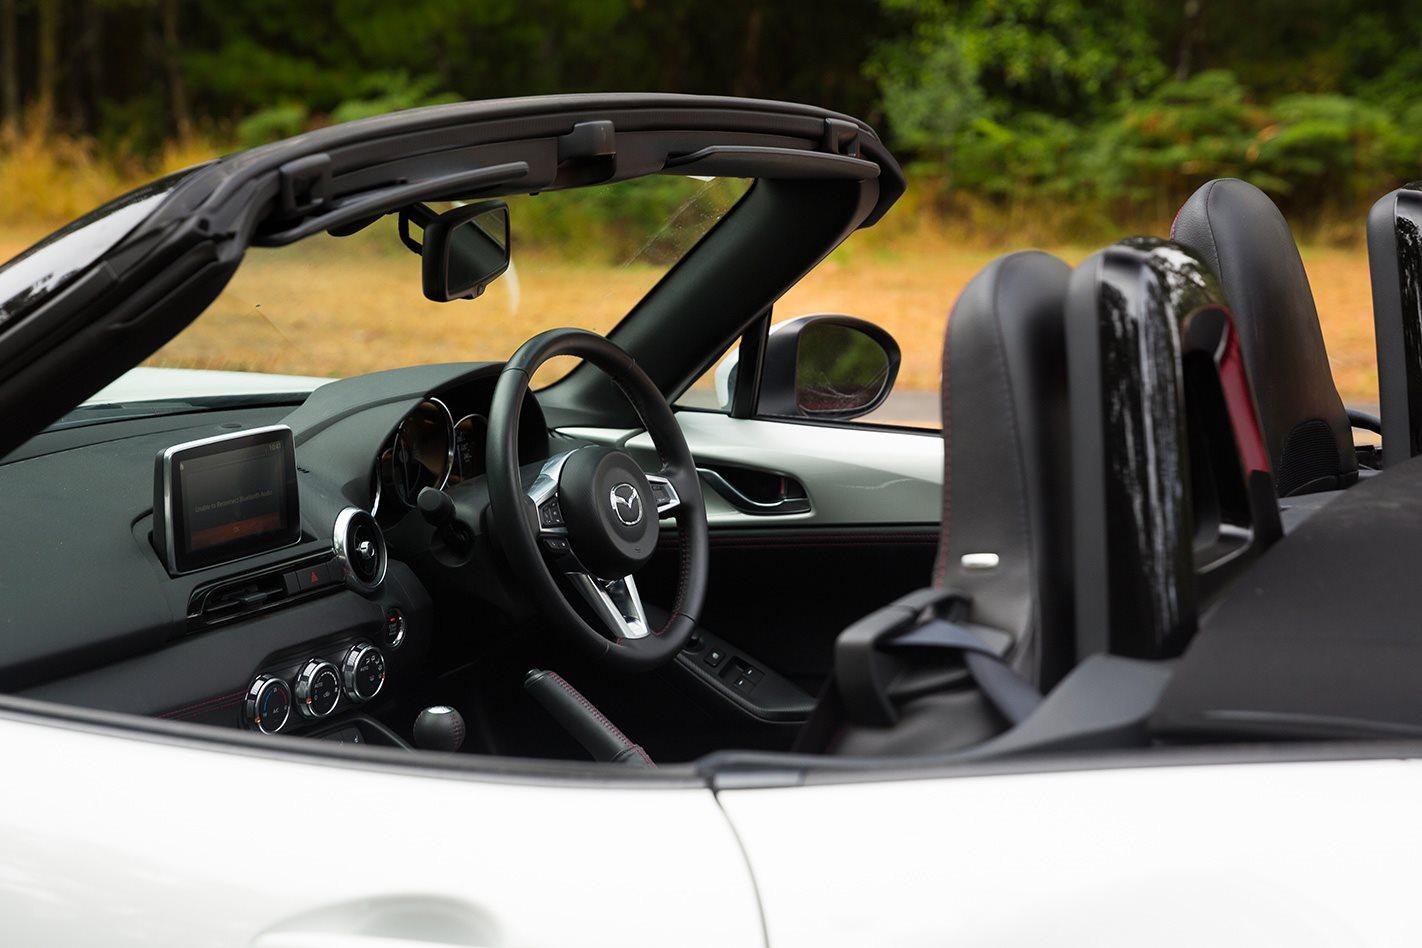 2017 Mazda MX-5 convertible